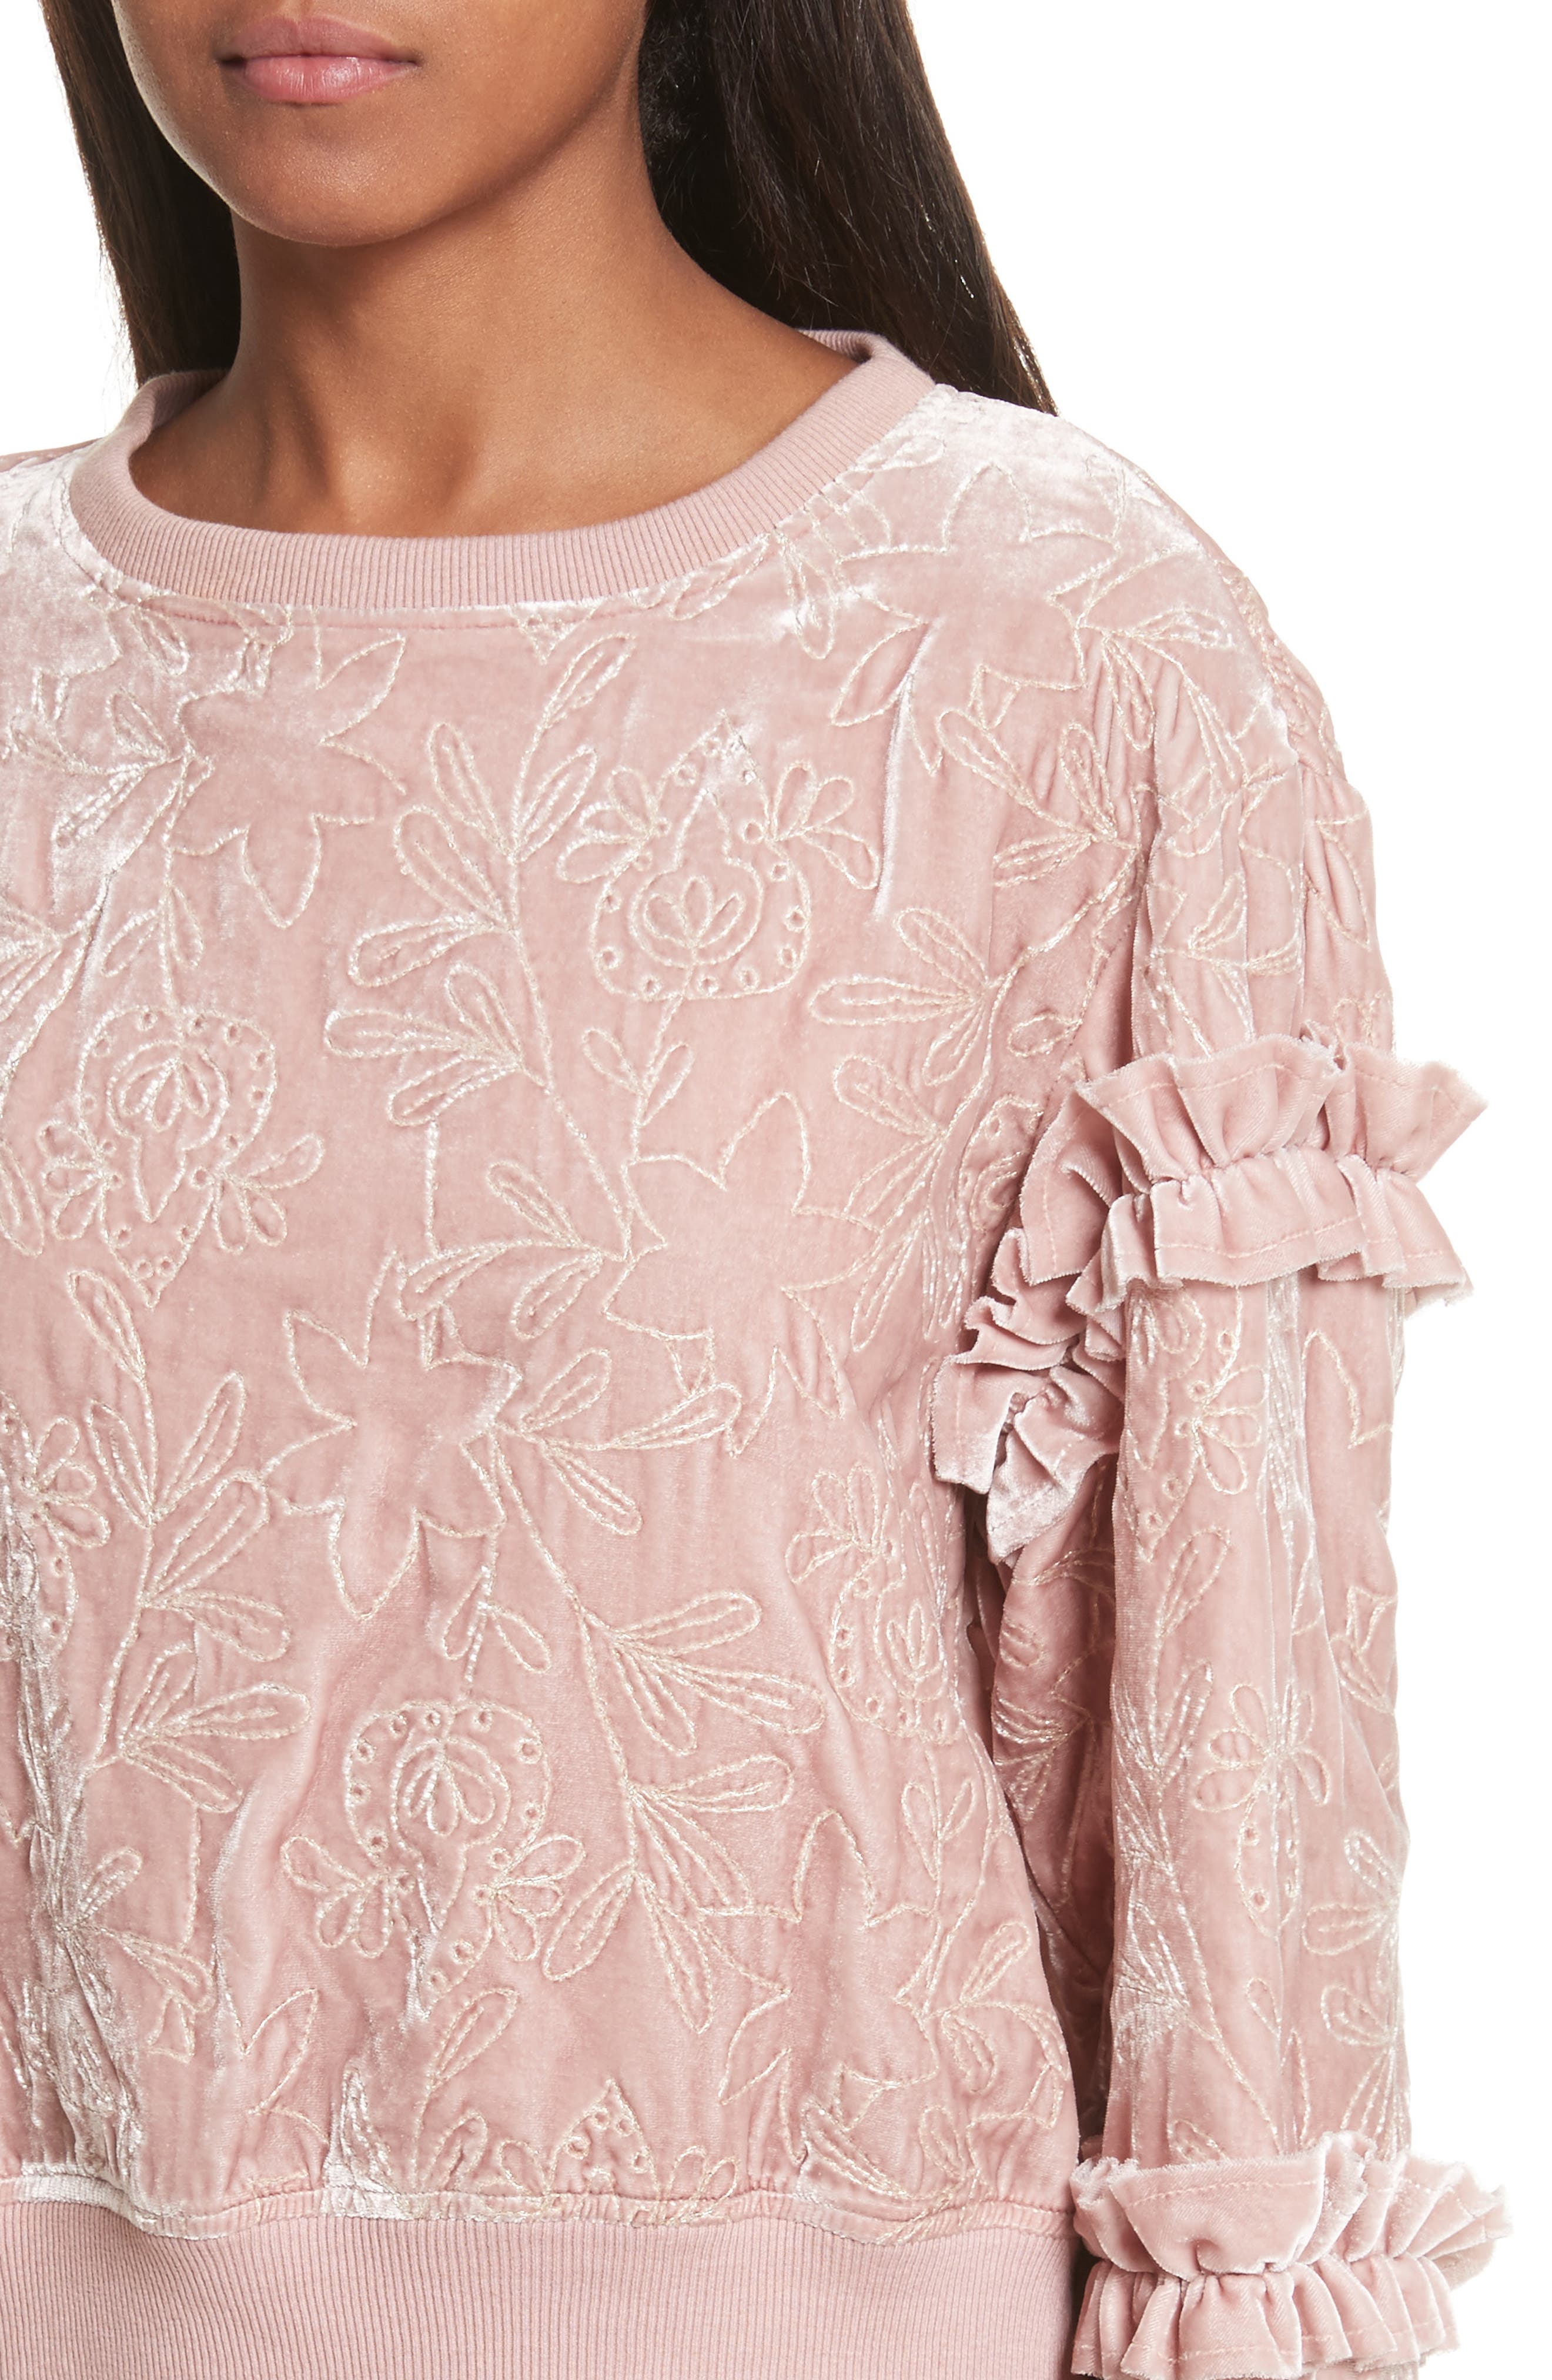 Nara Embroidered Velvet Sweatshirt,                             Alternate thumbnail 4, color,                             Mauve